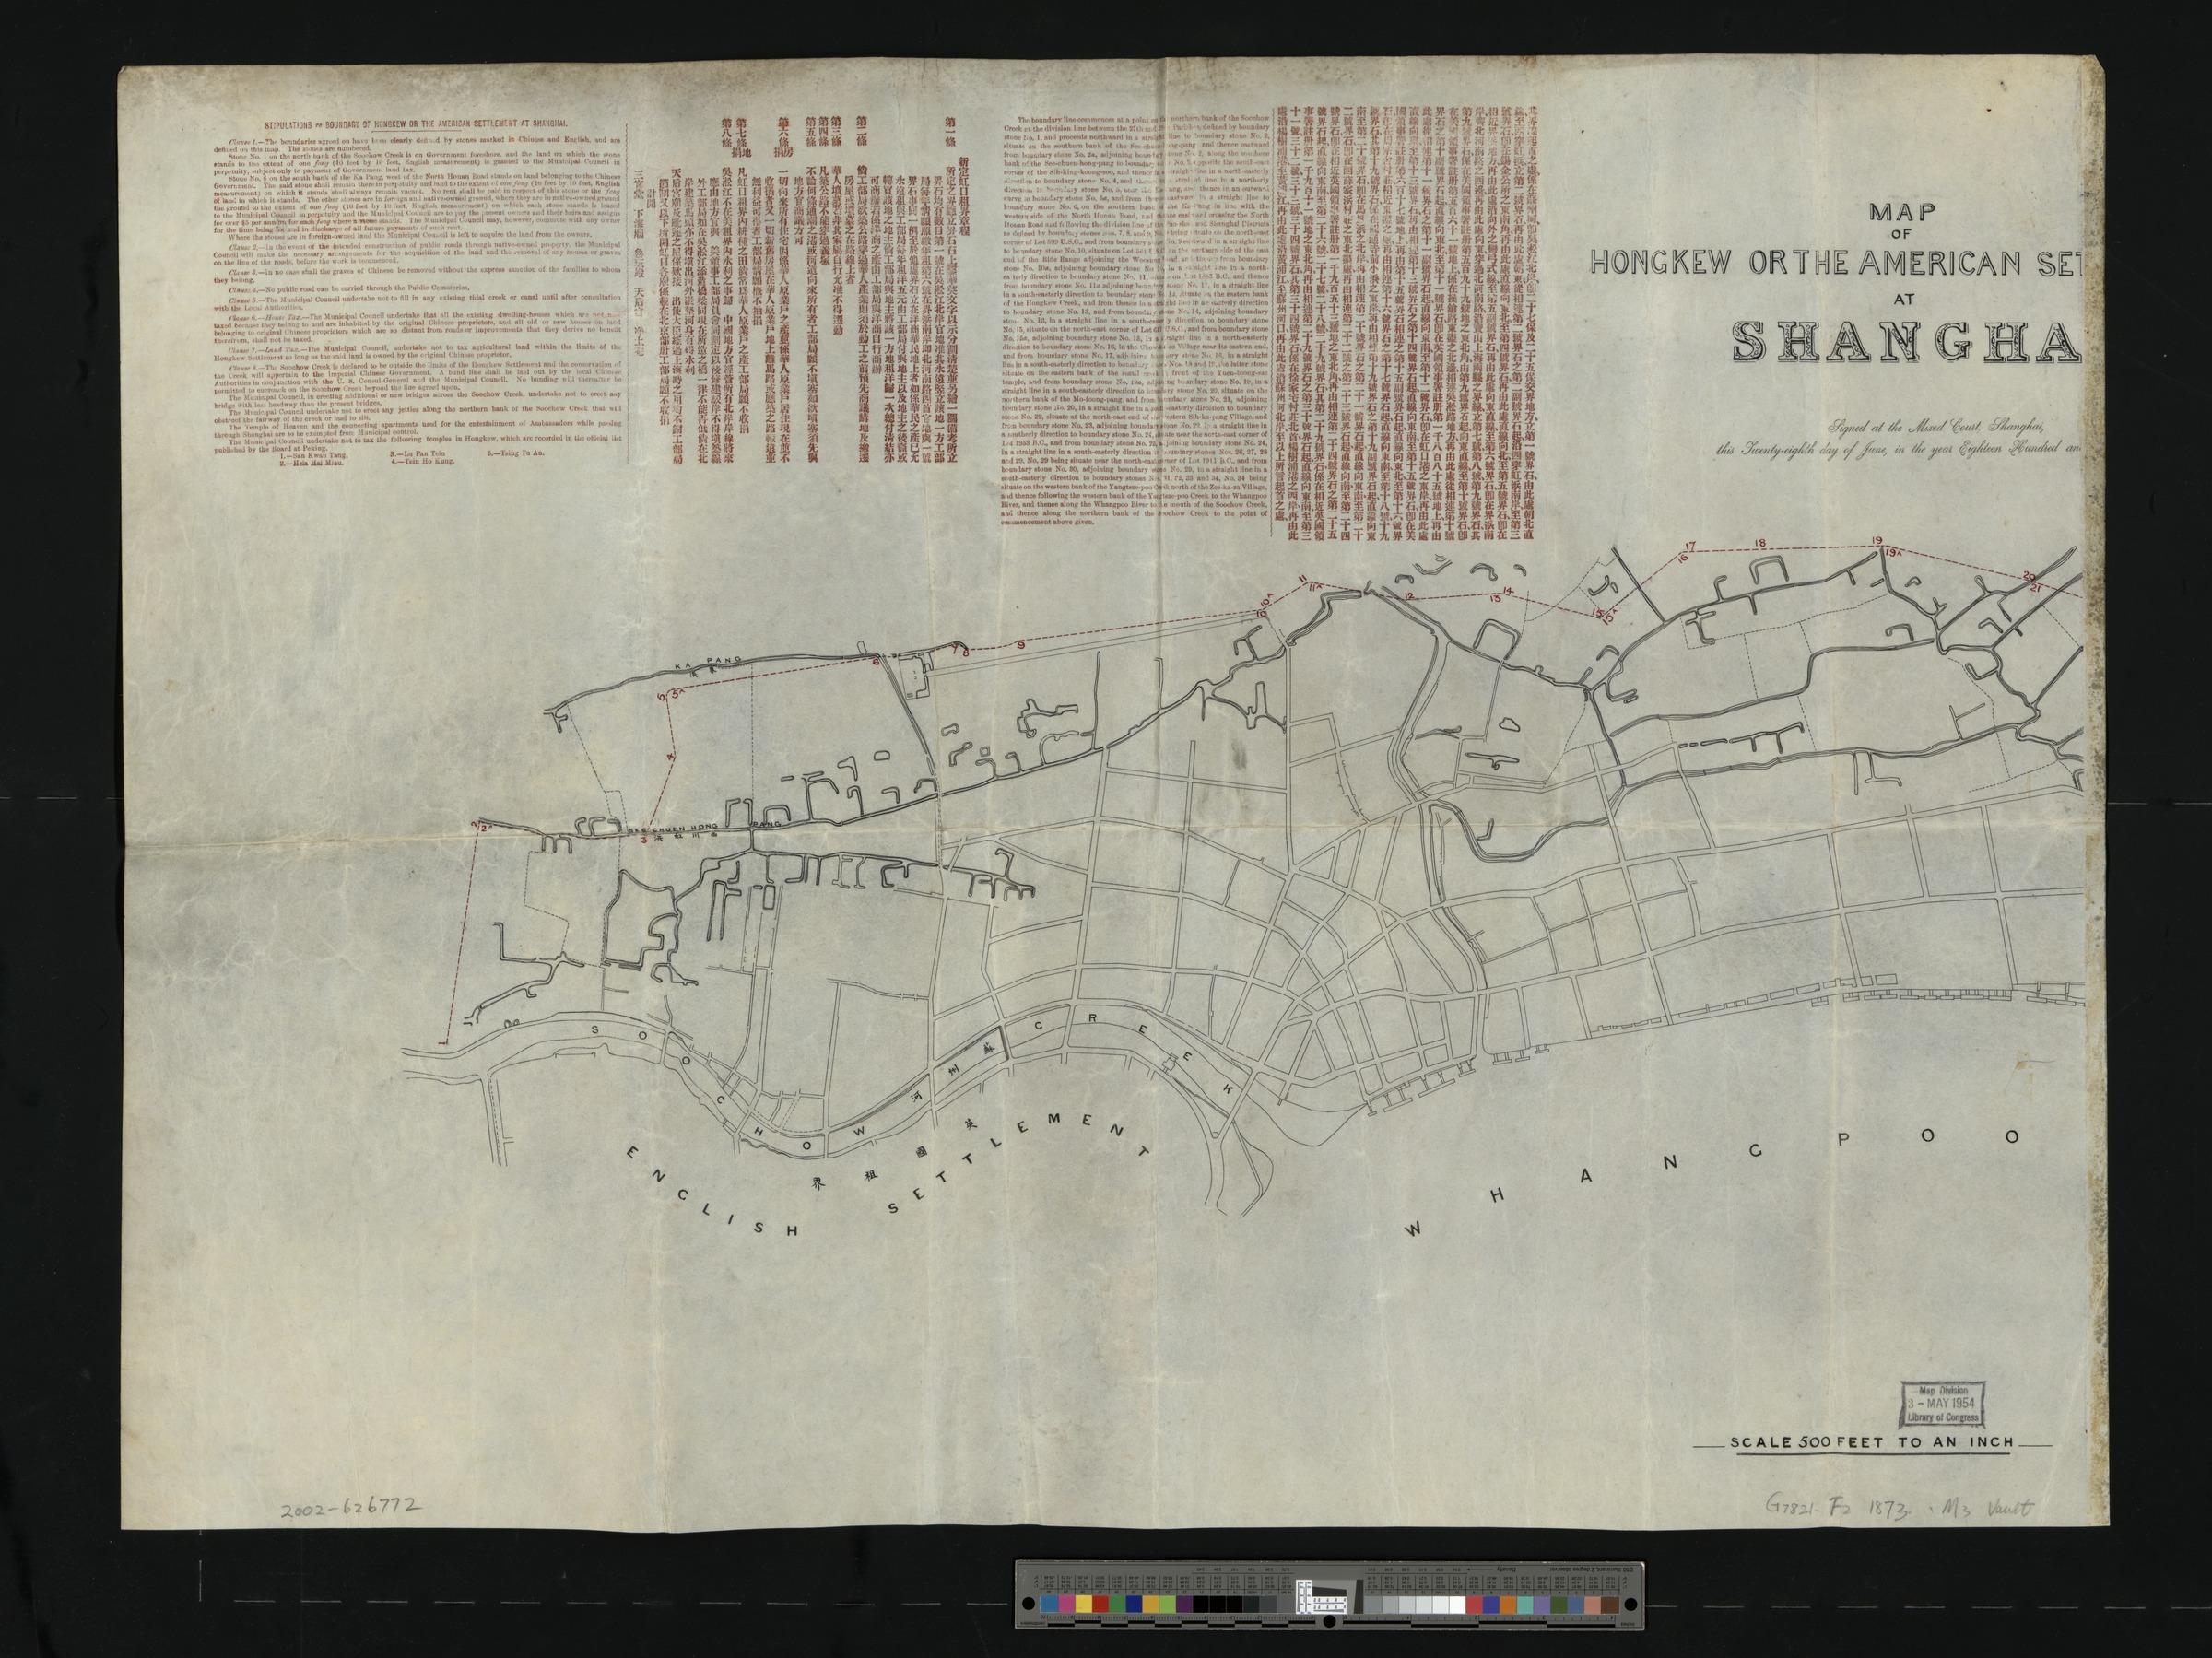 Library of Congress - Map Division | Virtual Shanghai